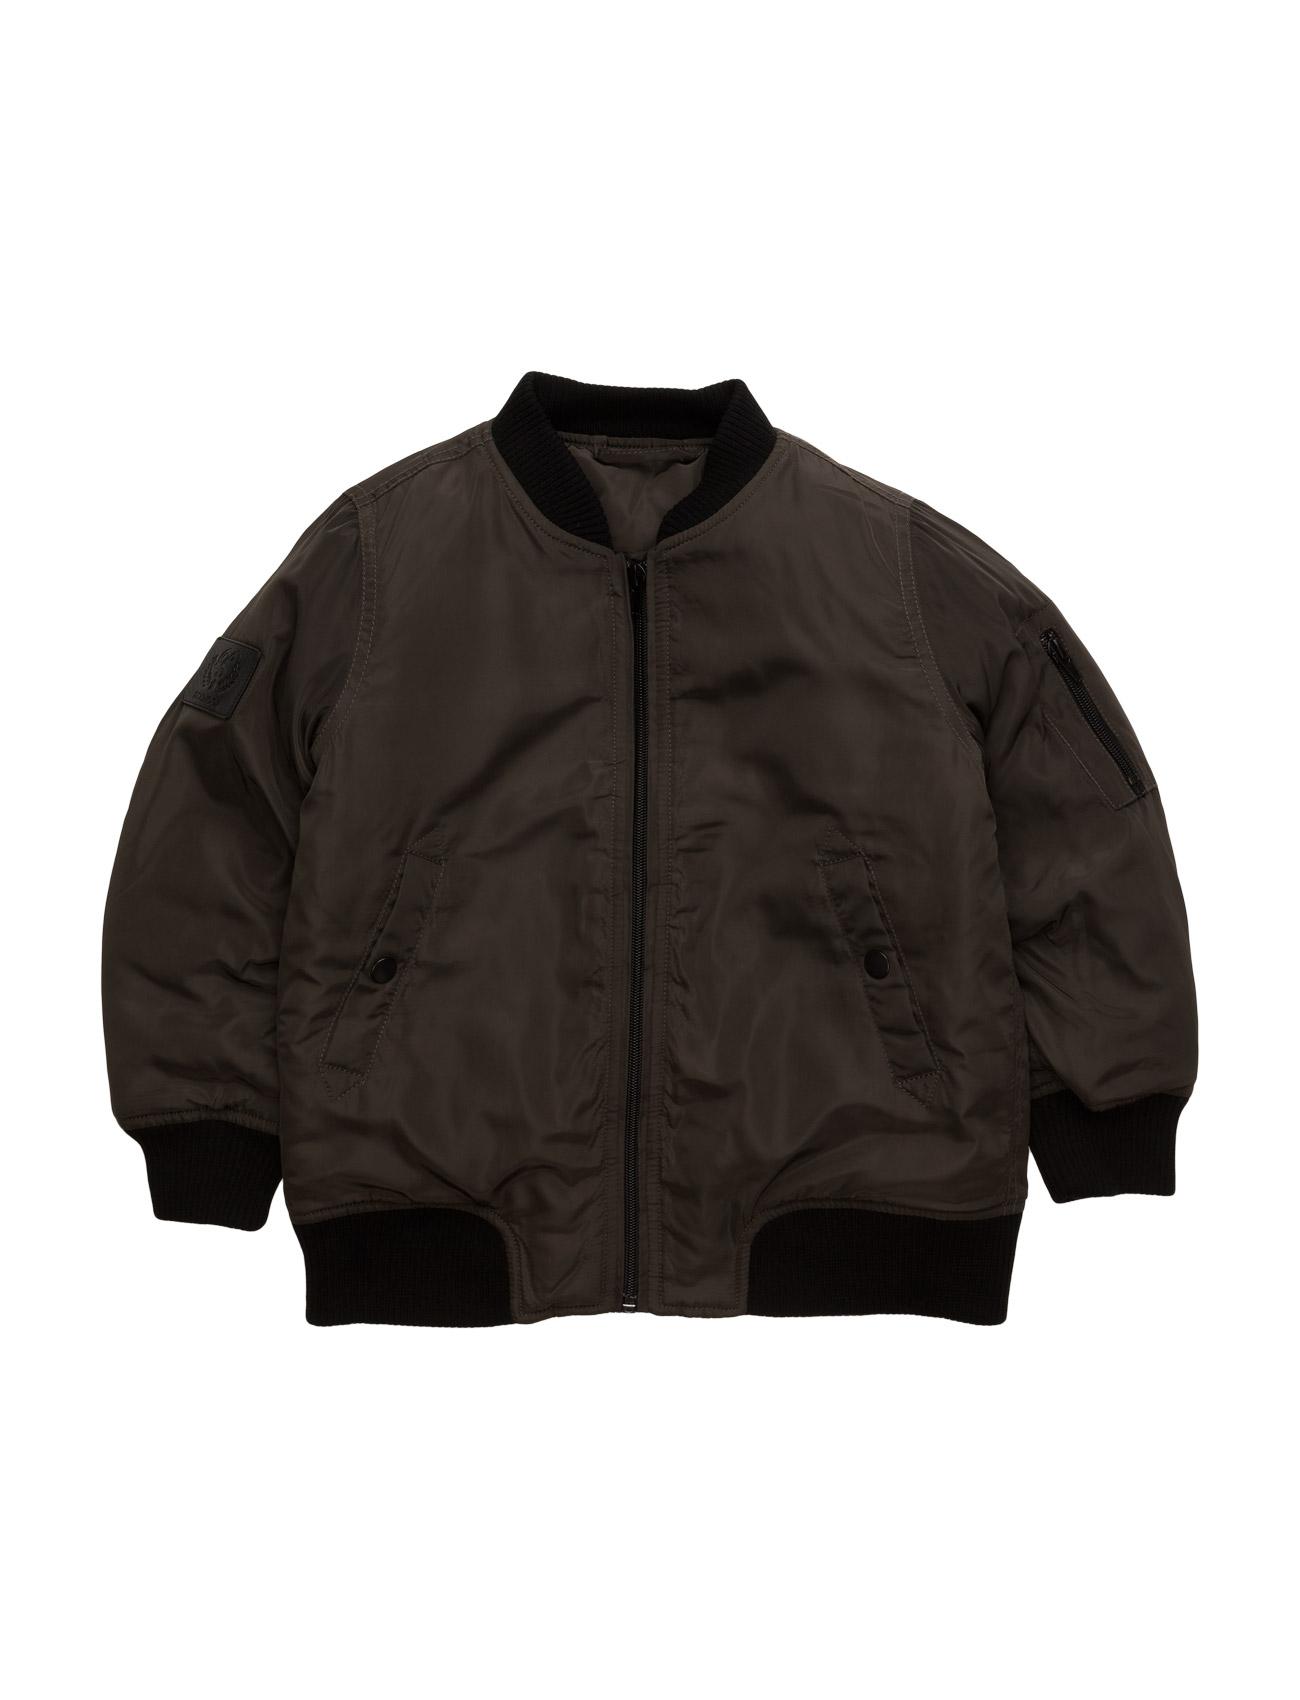 9ca42332e8b0 Jacket Petit by Sofie Schnoor Jakker   Frakker til Børn i